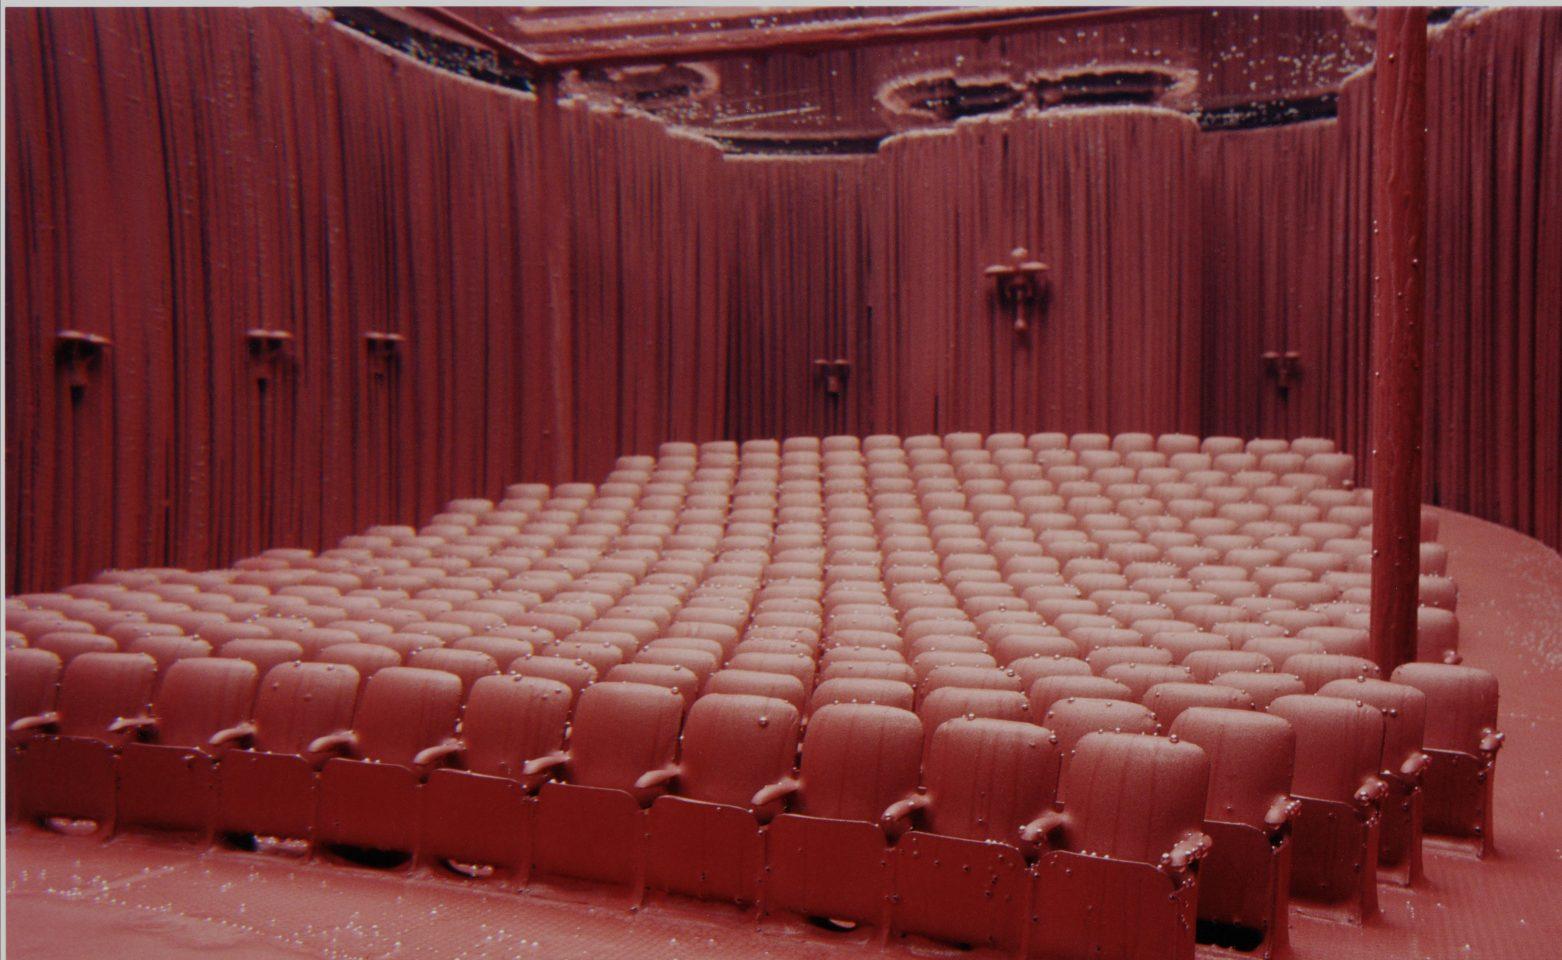 <p>Saskia Olde Wolbers,<em>Trailer</em>, video still, 2005, Single channel video projection</p>